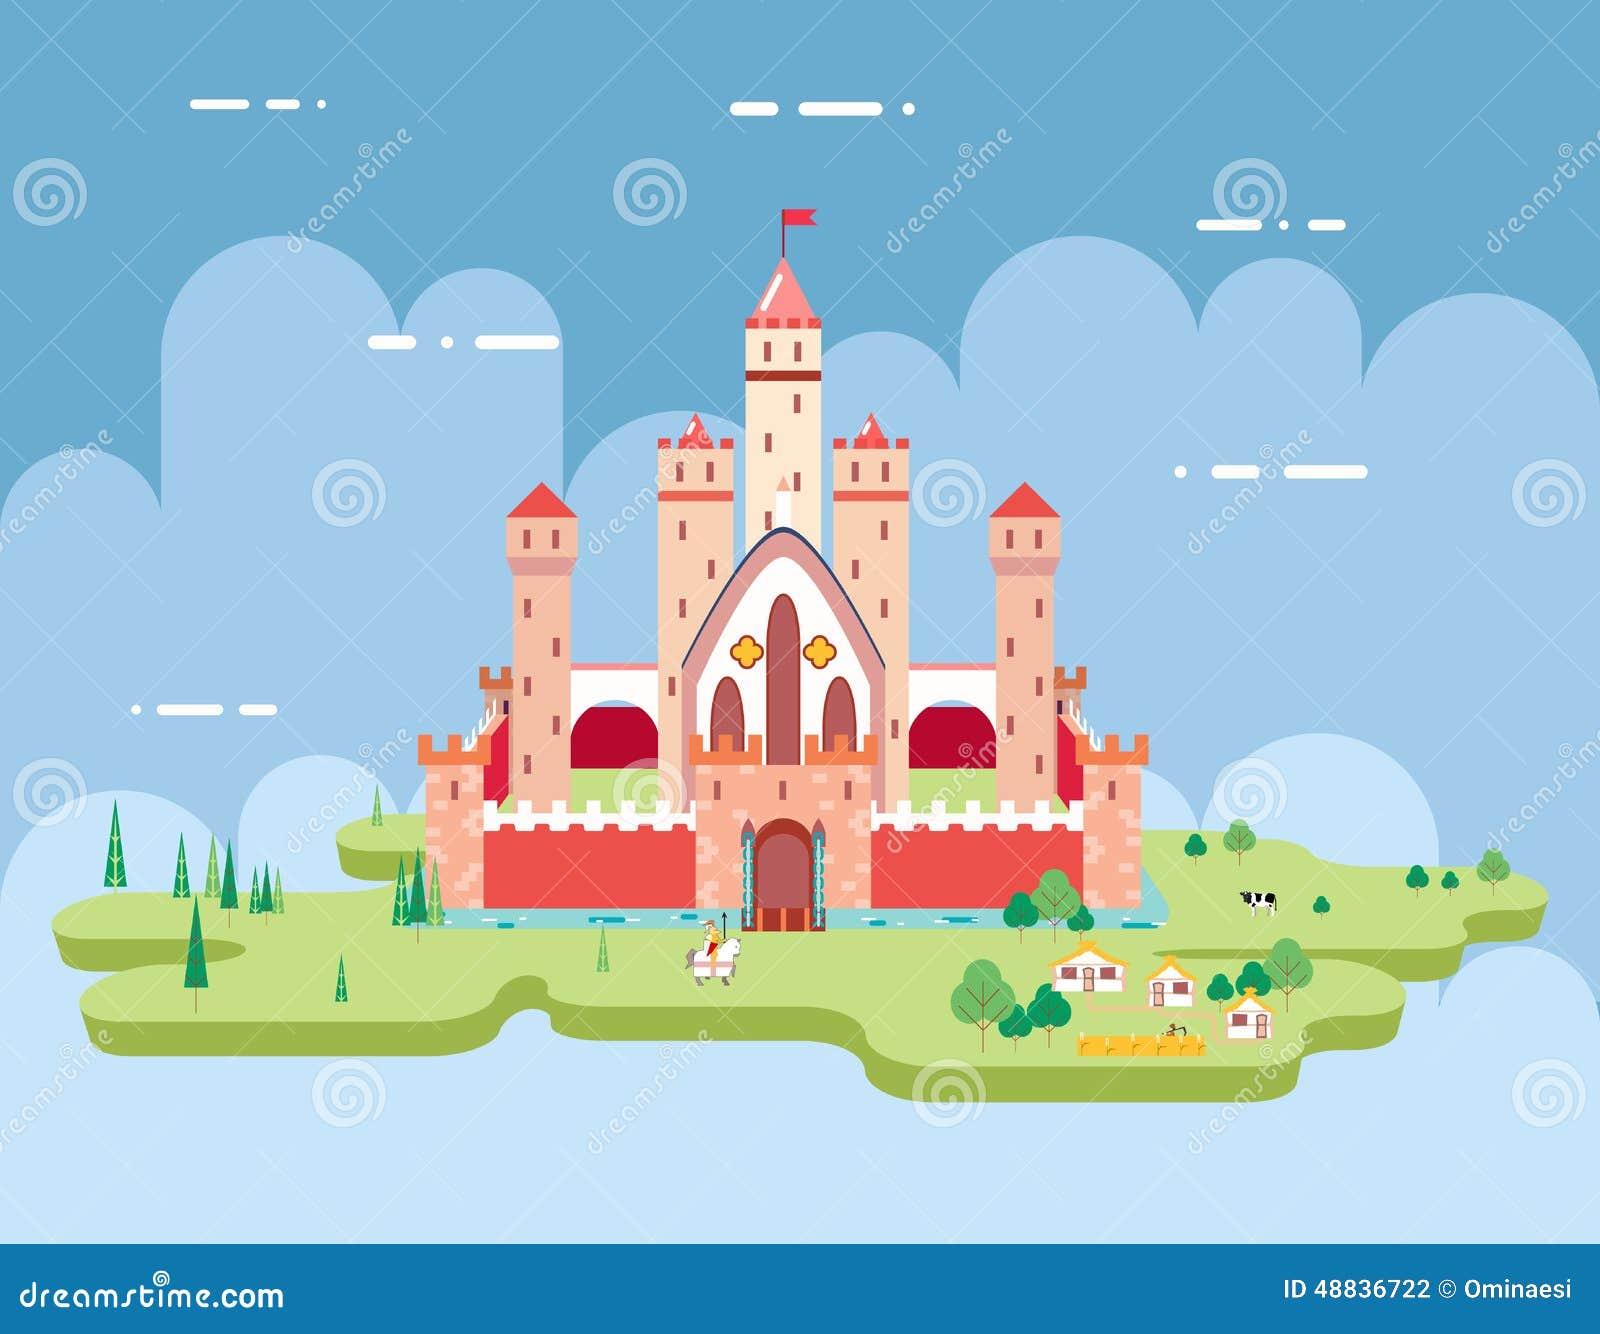 fantasy world map hogwarts